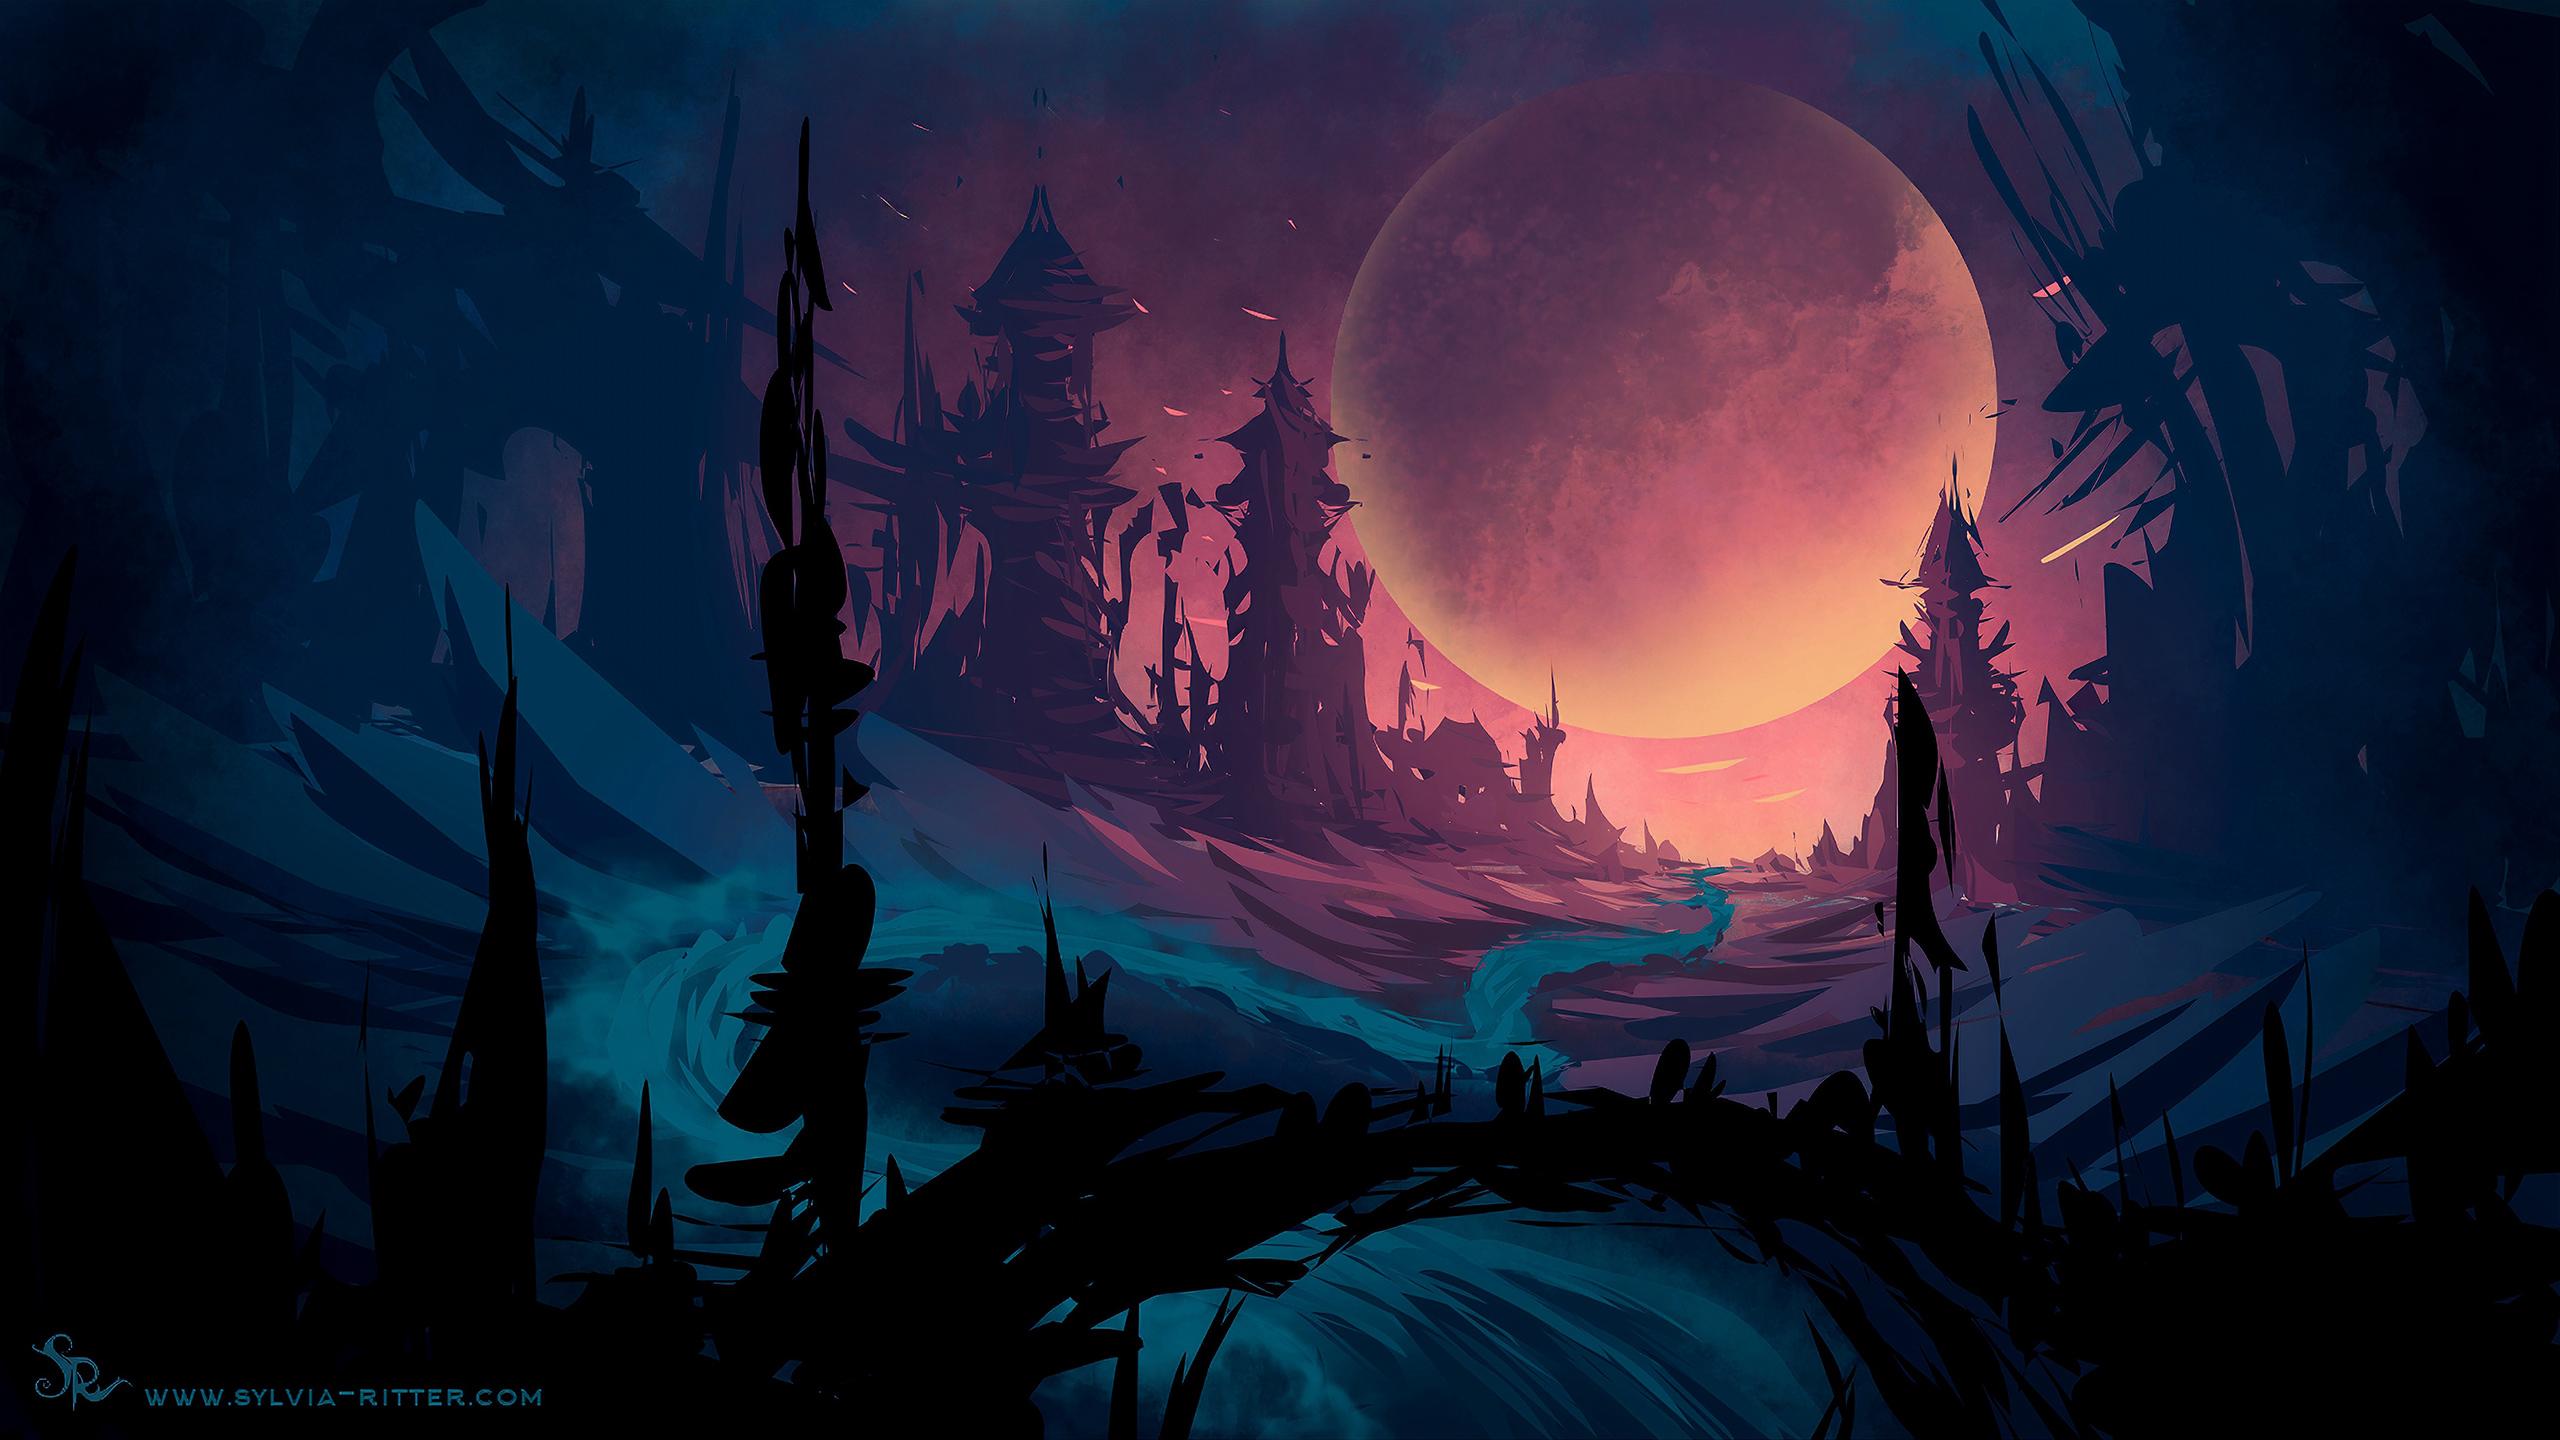 General 2560x1440 digital digital art artwork illustration drawing painting digital painting landscape dark planet fantasy art science fiction sky calm krita wood apocalyptic ruin ruins watermarked